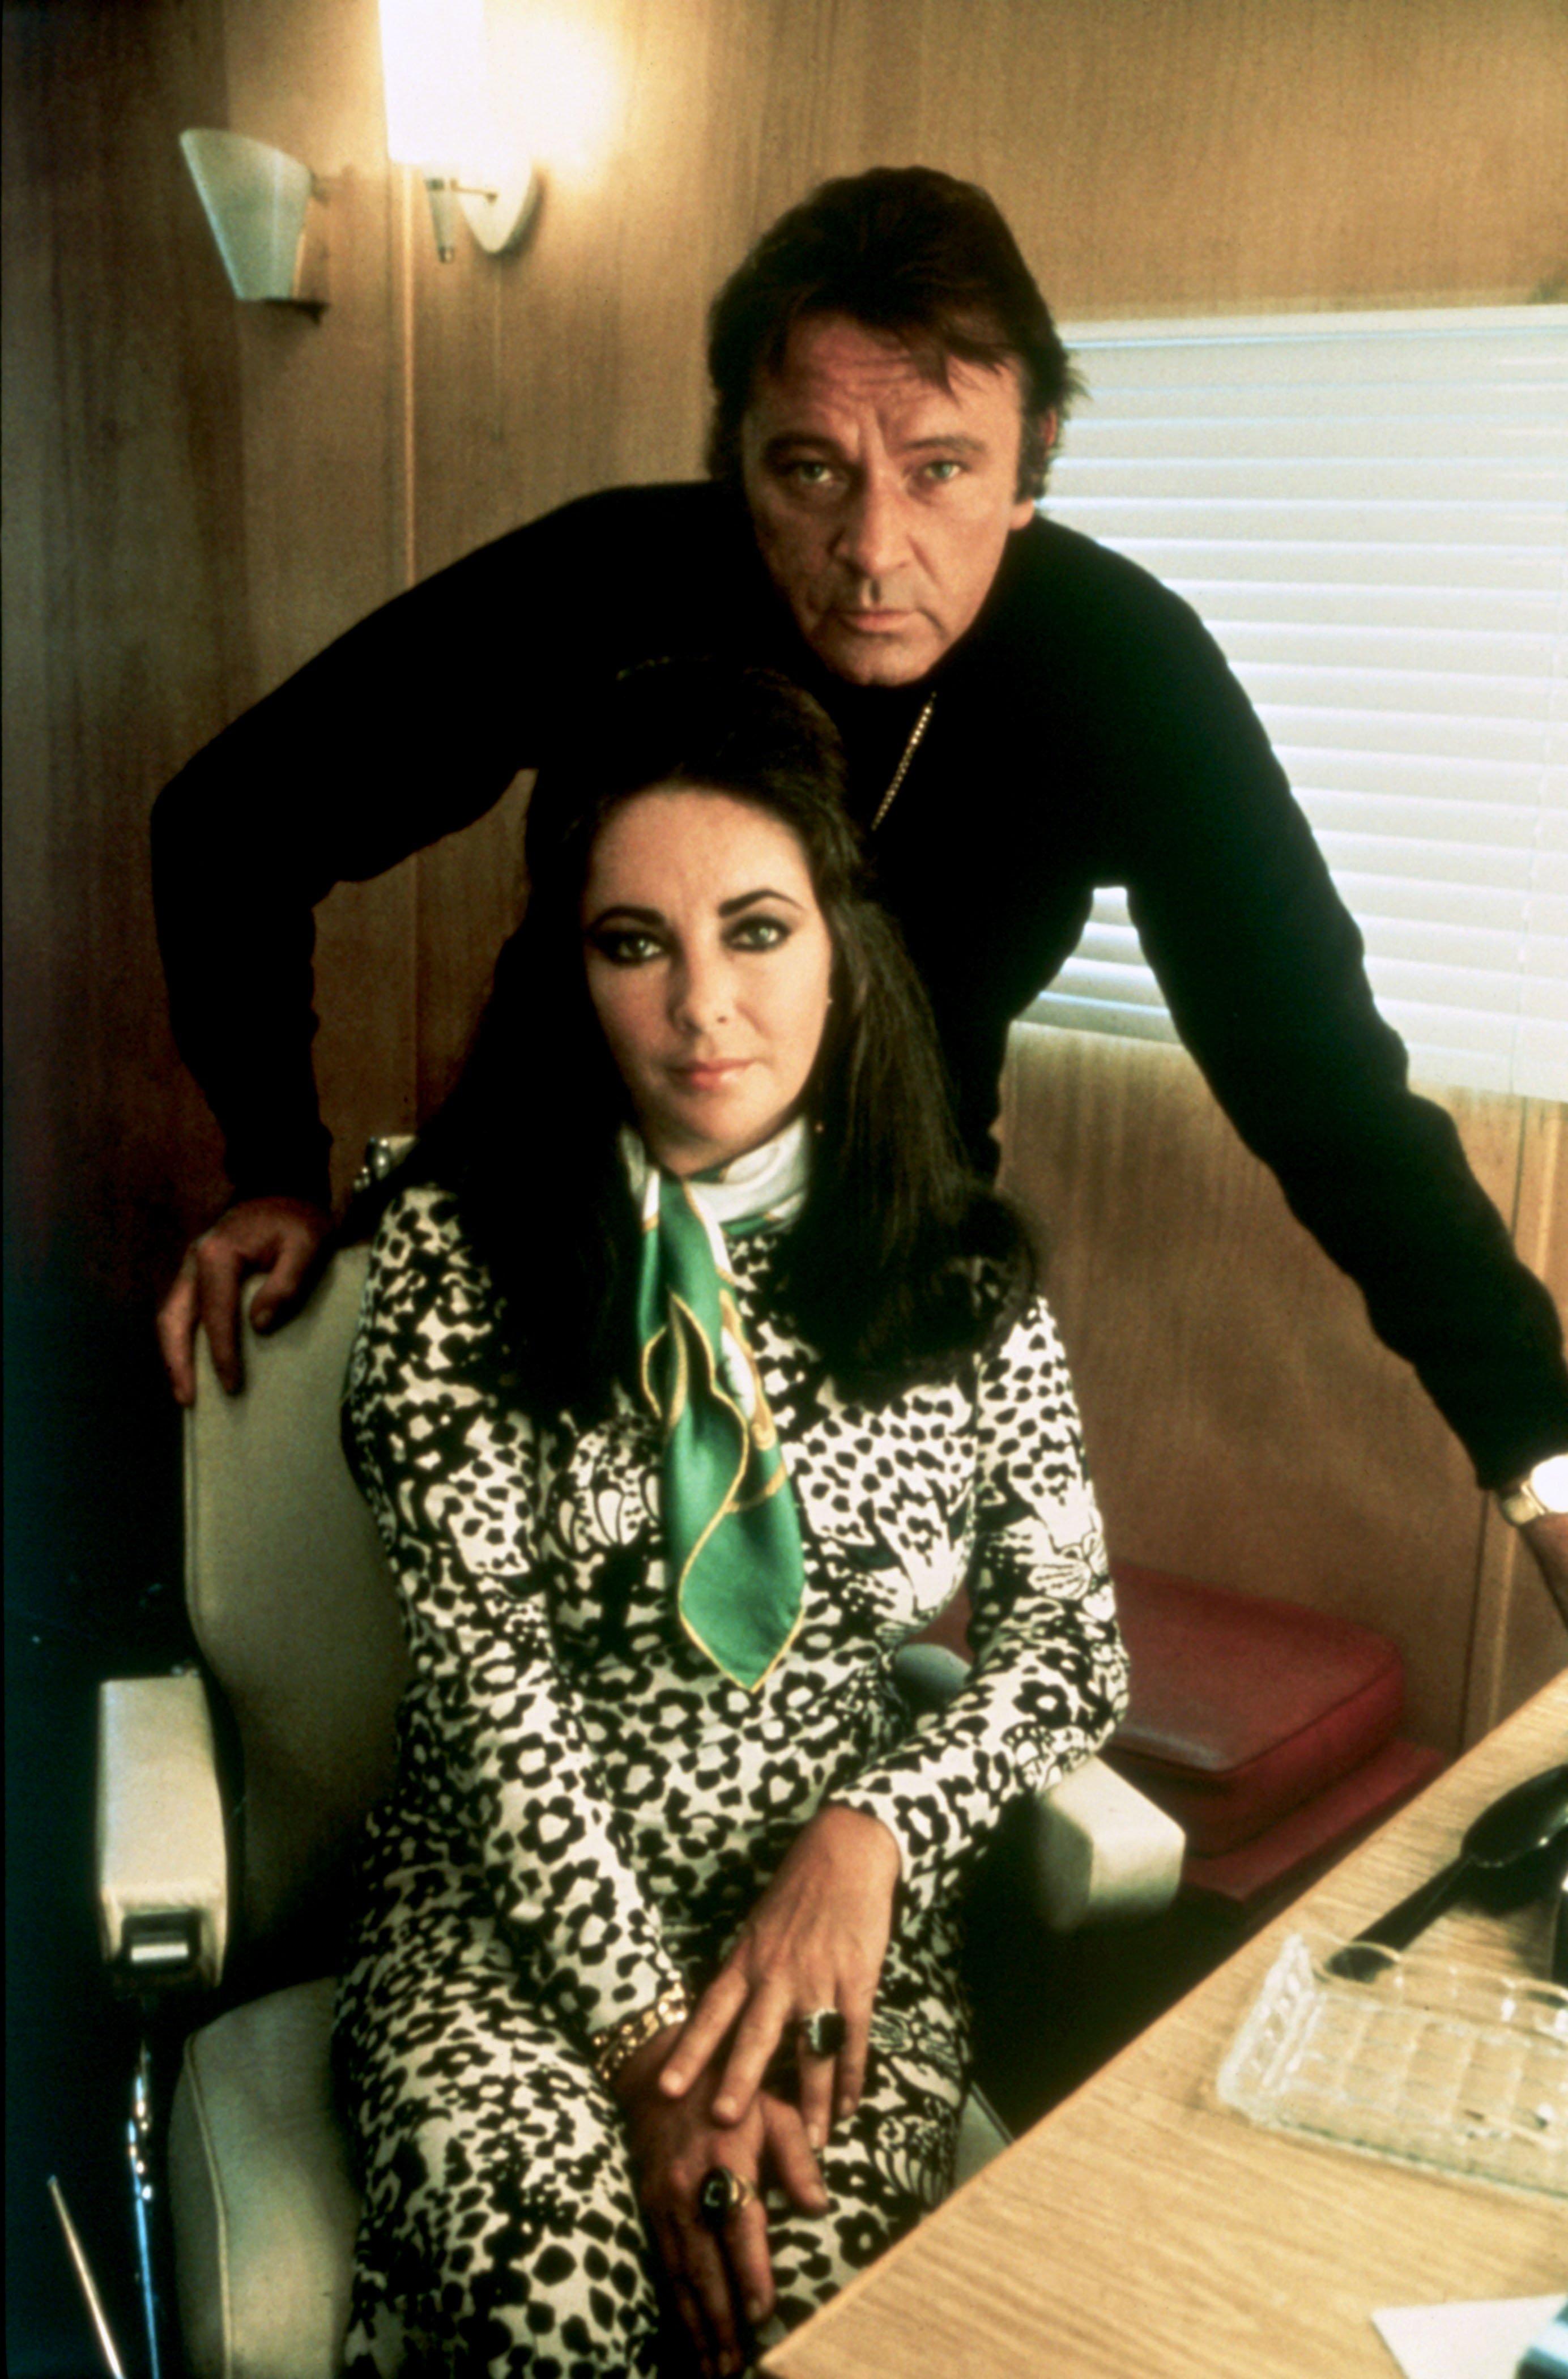 Elizabeth Taylor and Richard Burton. I Image: Getty Images.